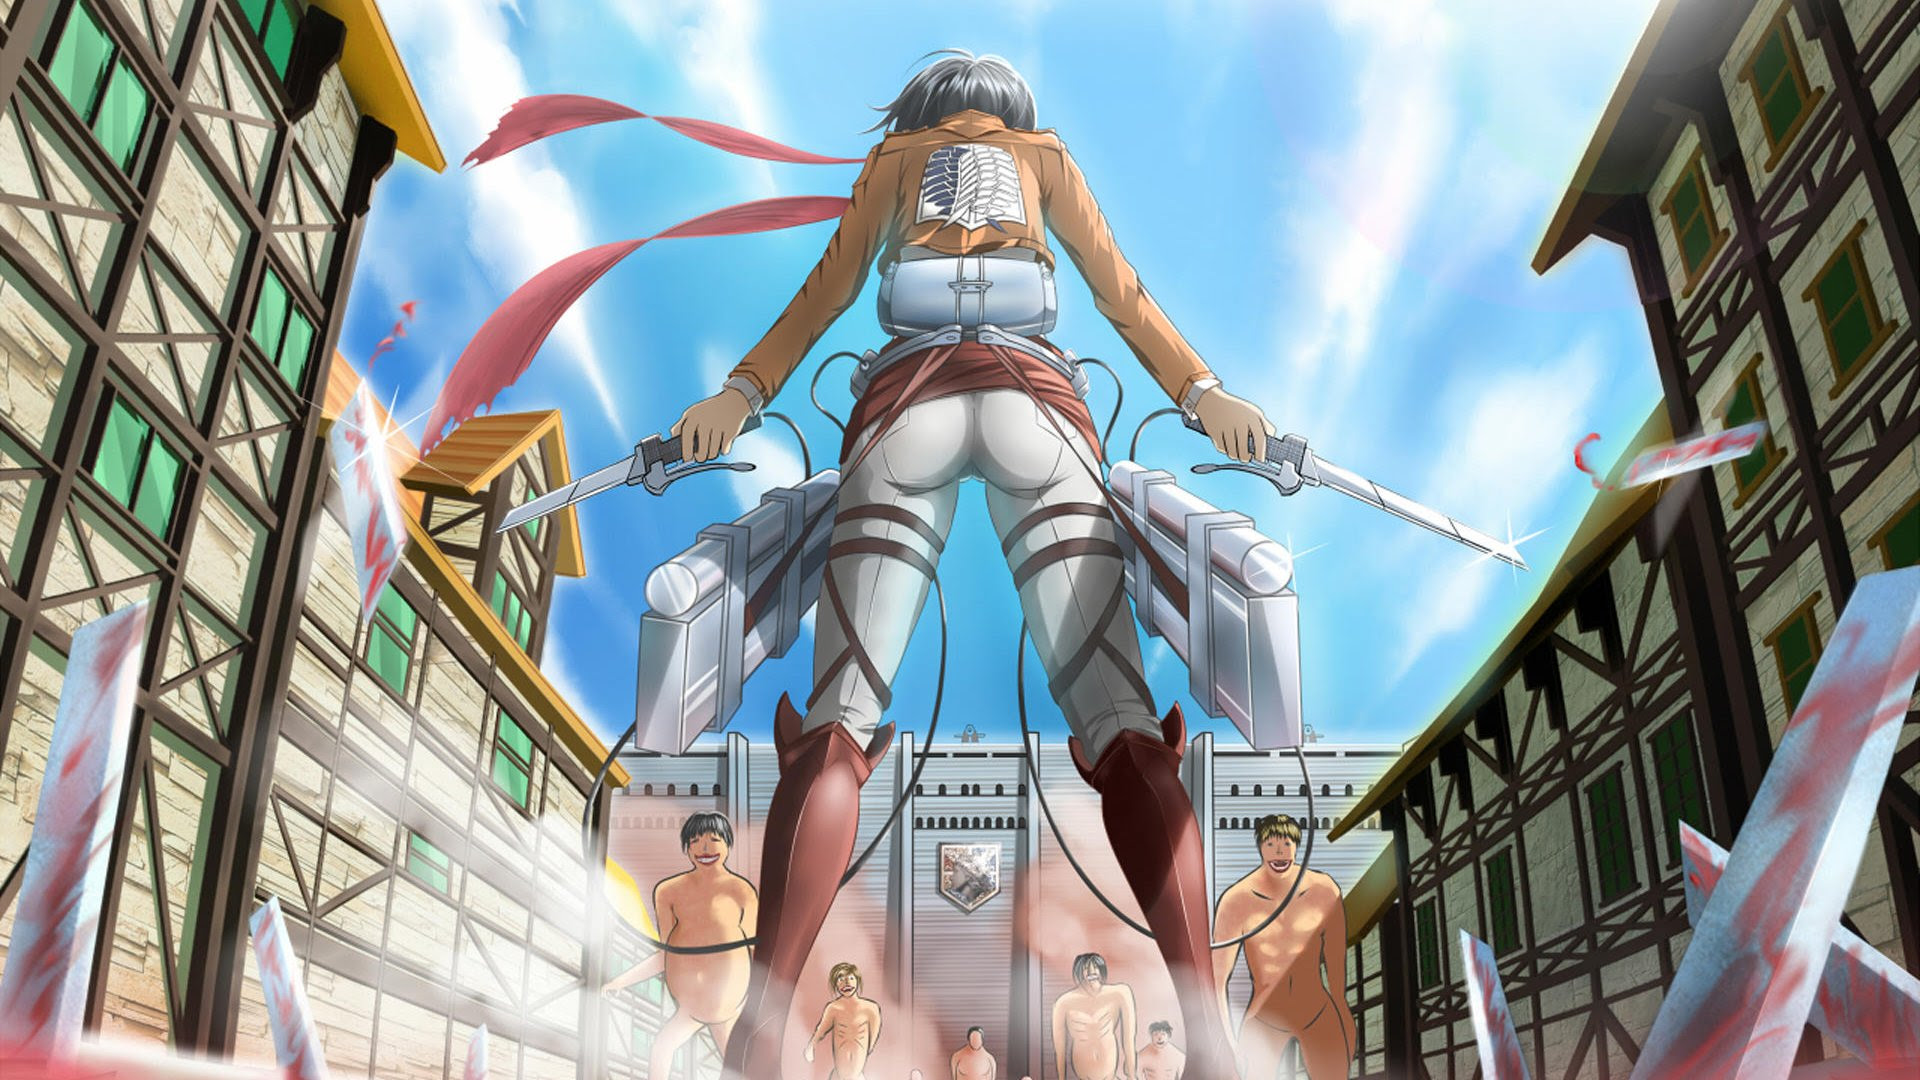 Mikasa Attack On Titan 壁紙 35693295 ファンポップ